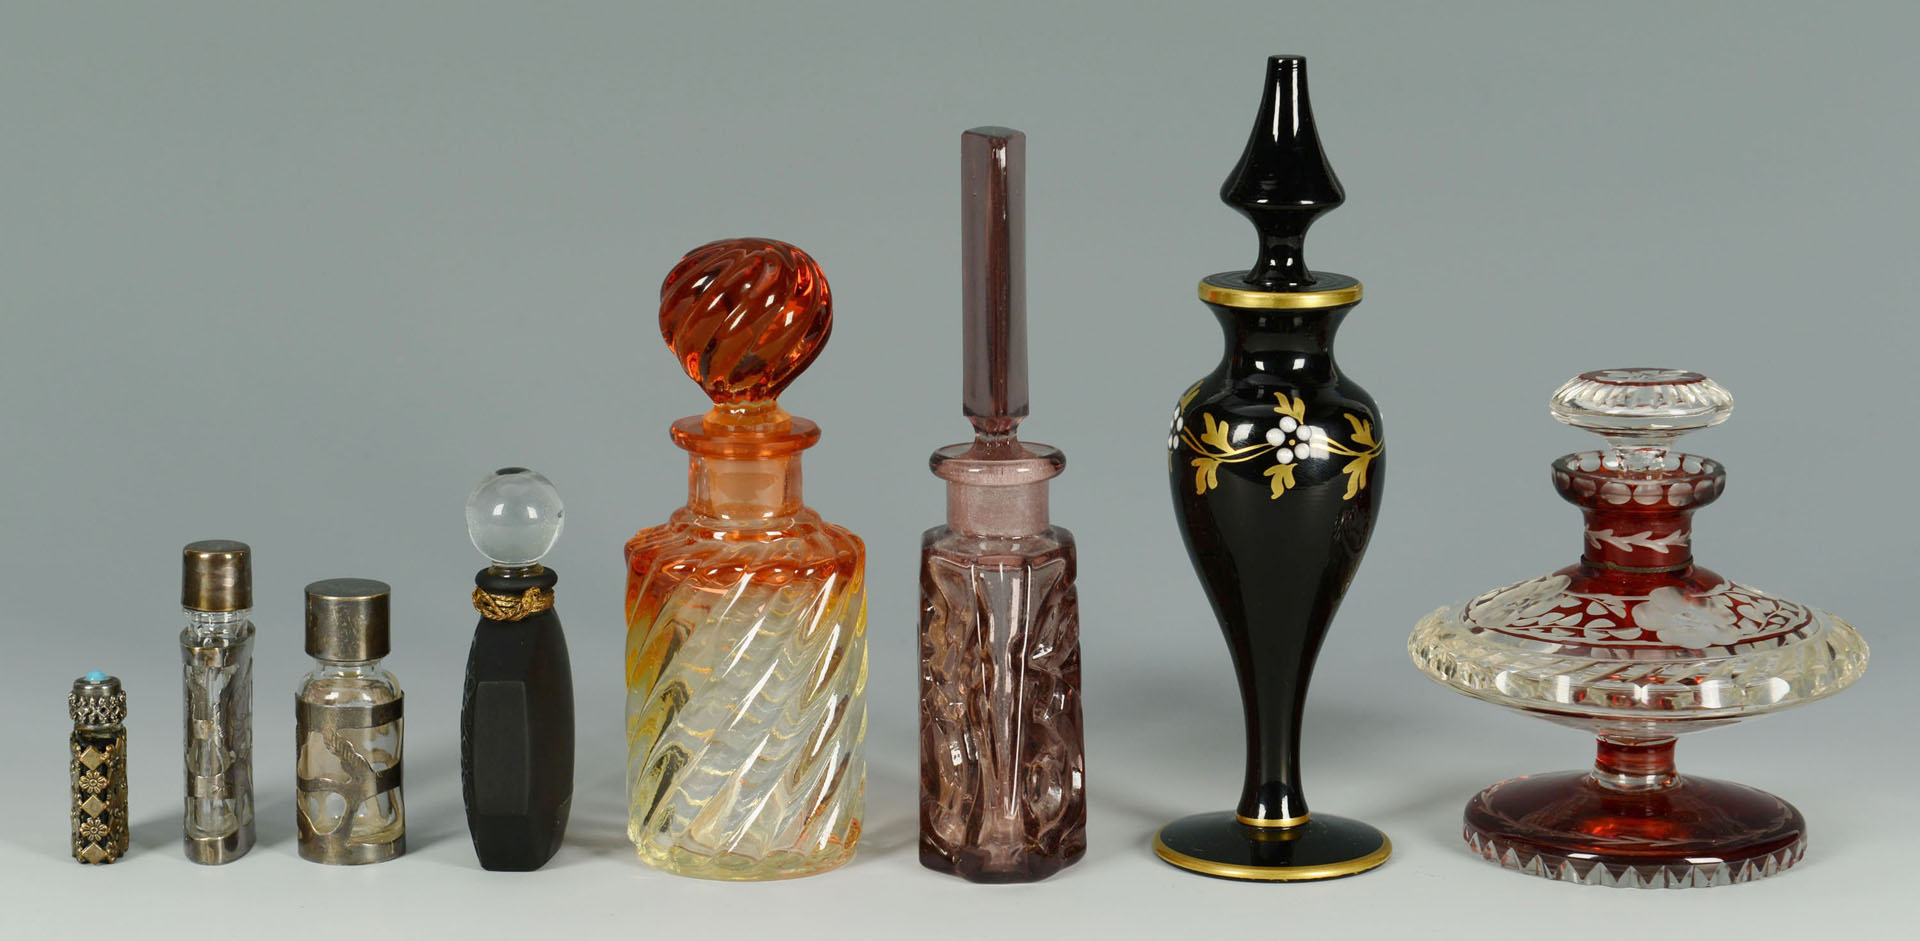 8 Vintage Decorative Perfume Bottles inc. colored